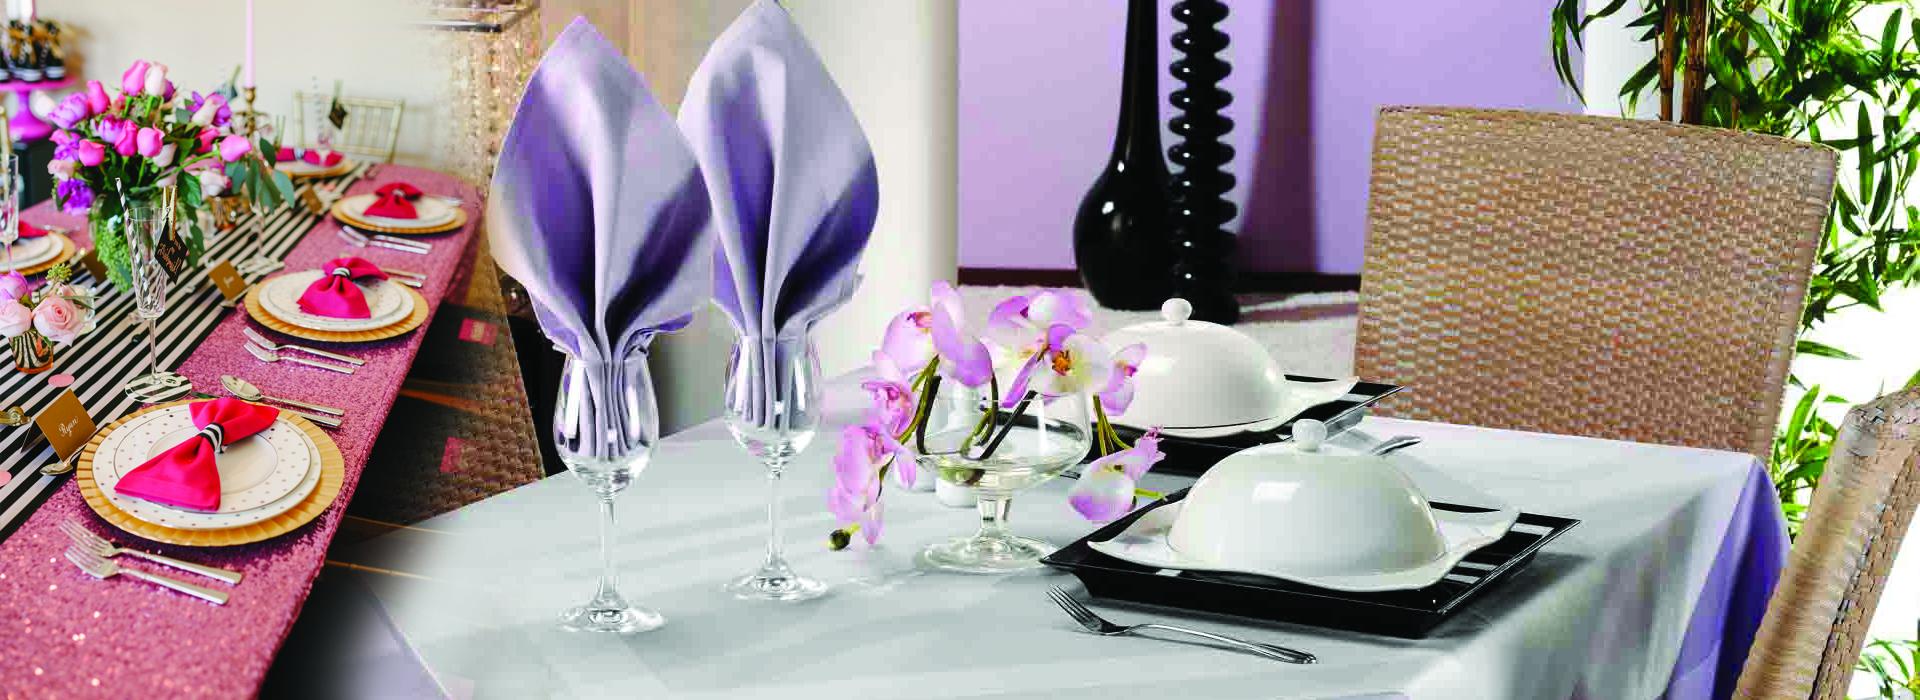 SNS Textiles - Manufacturers & Exporters of home textiles